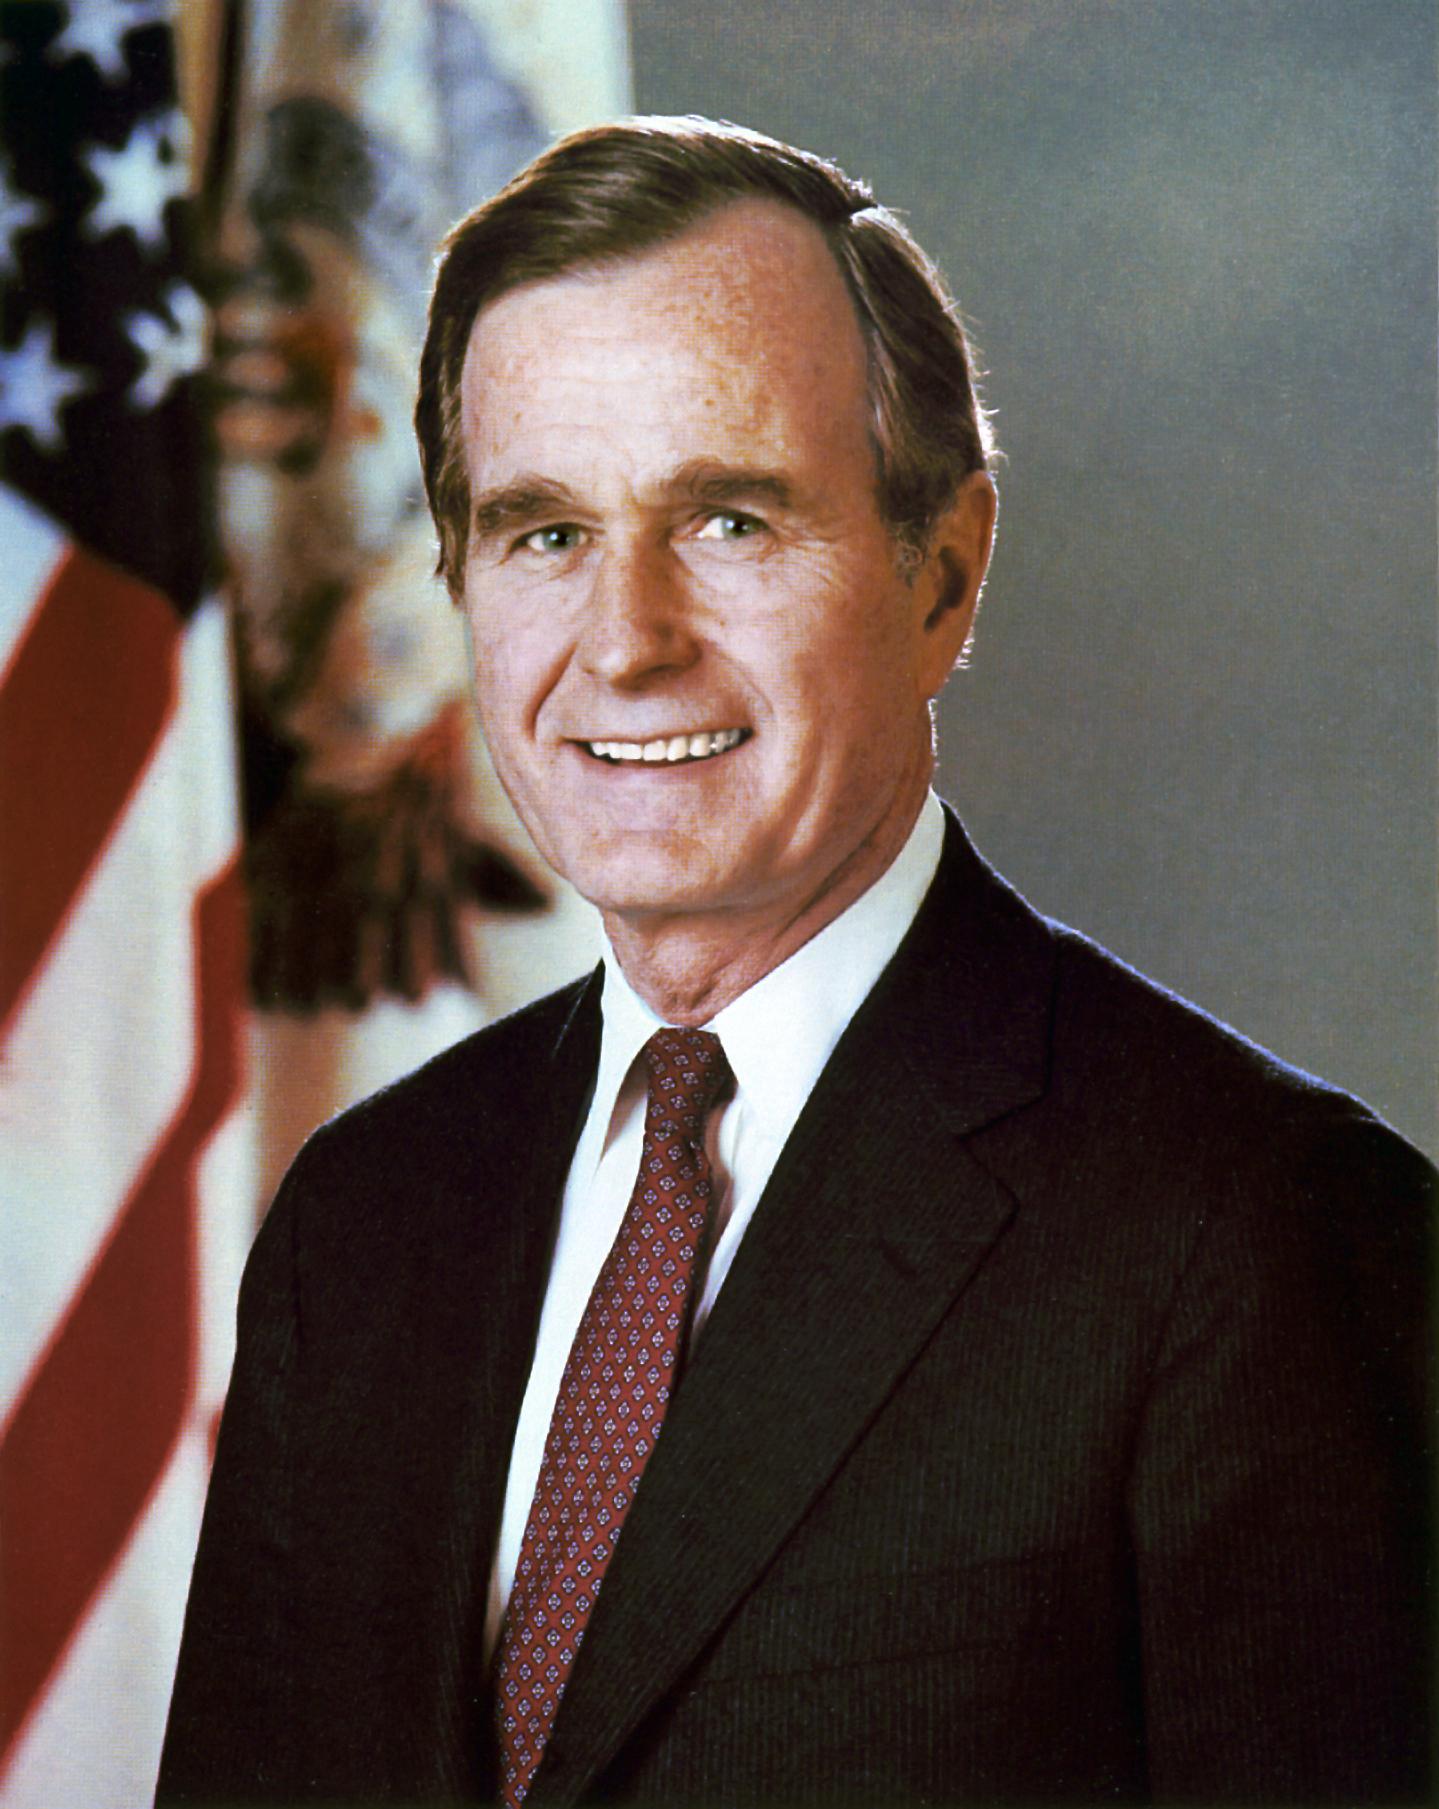 Remembering George H. W. Bush